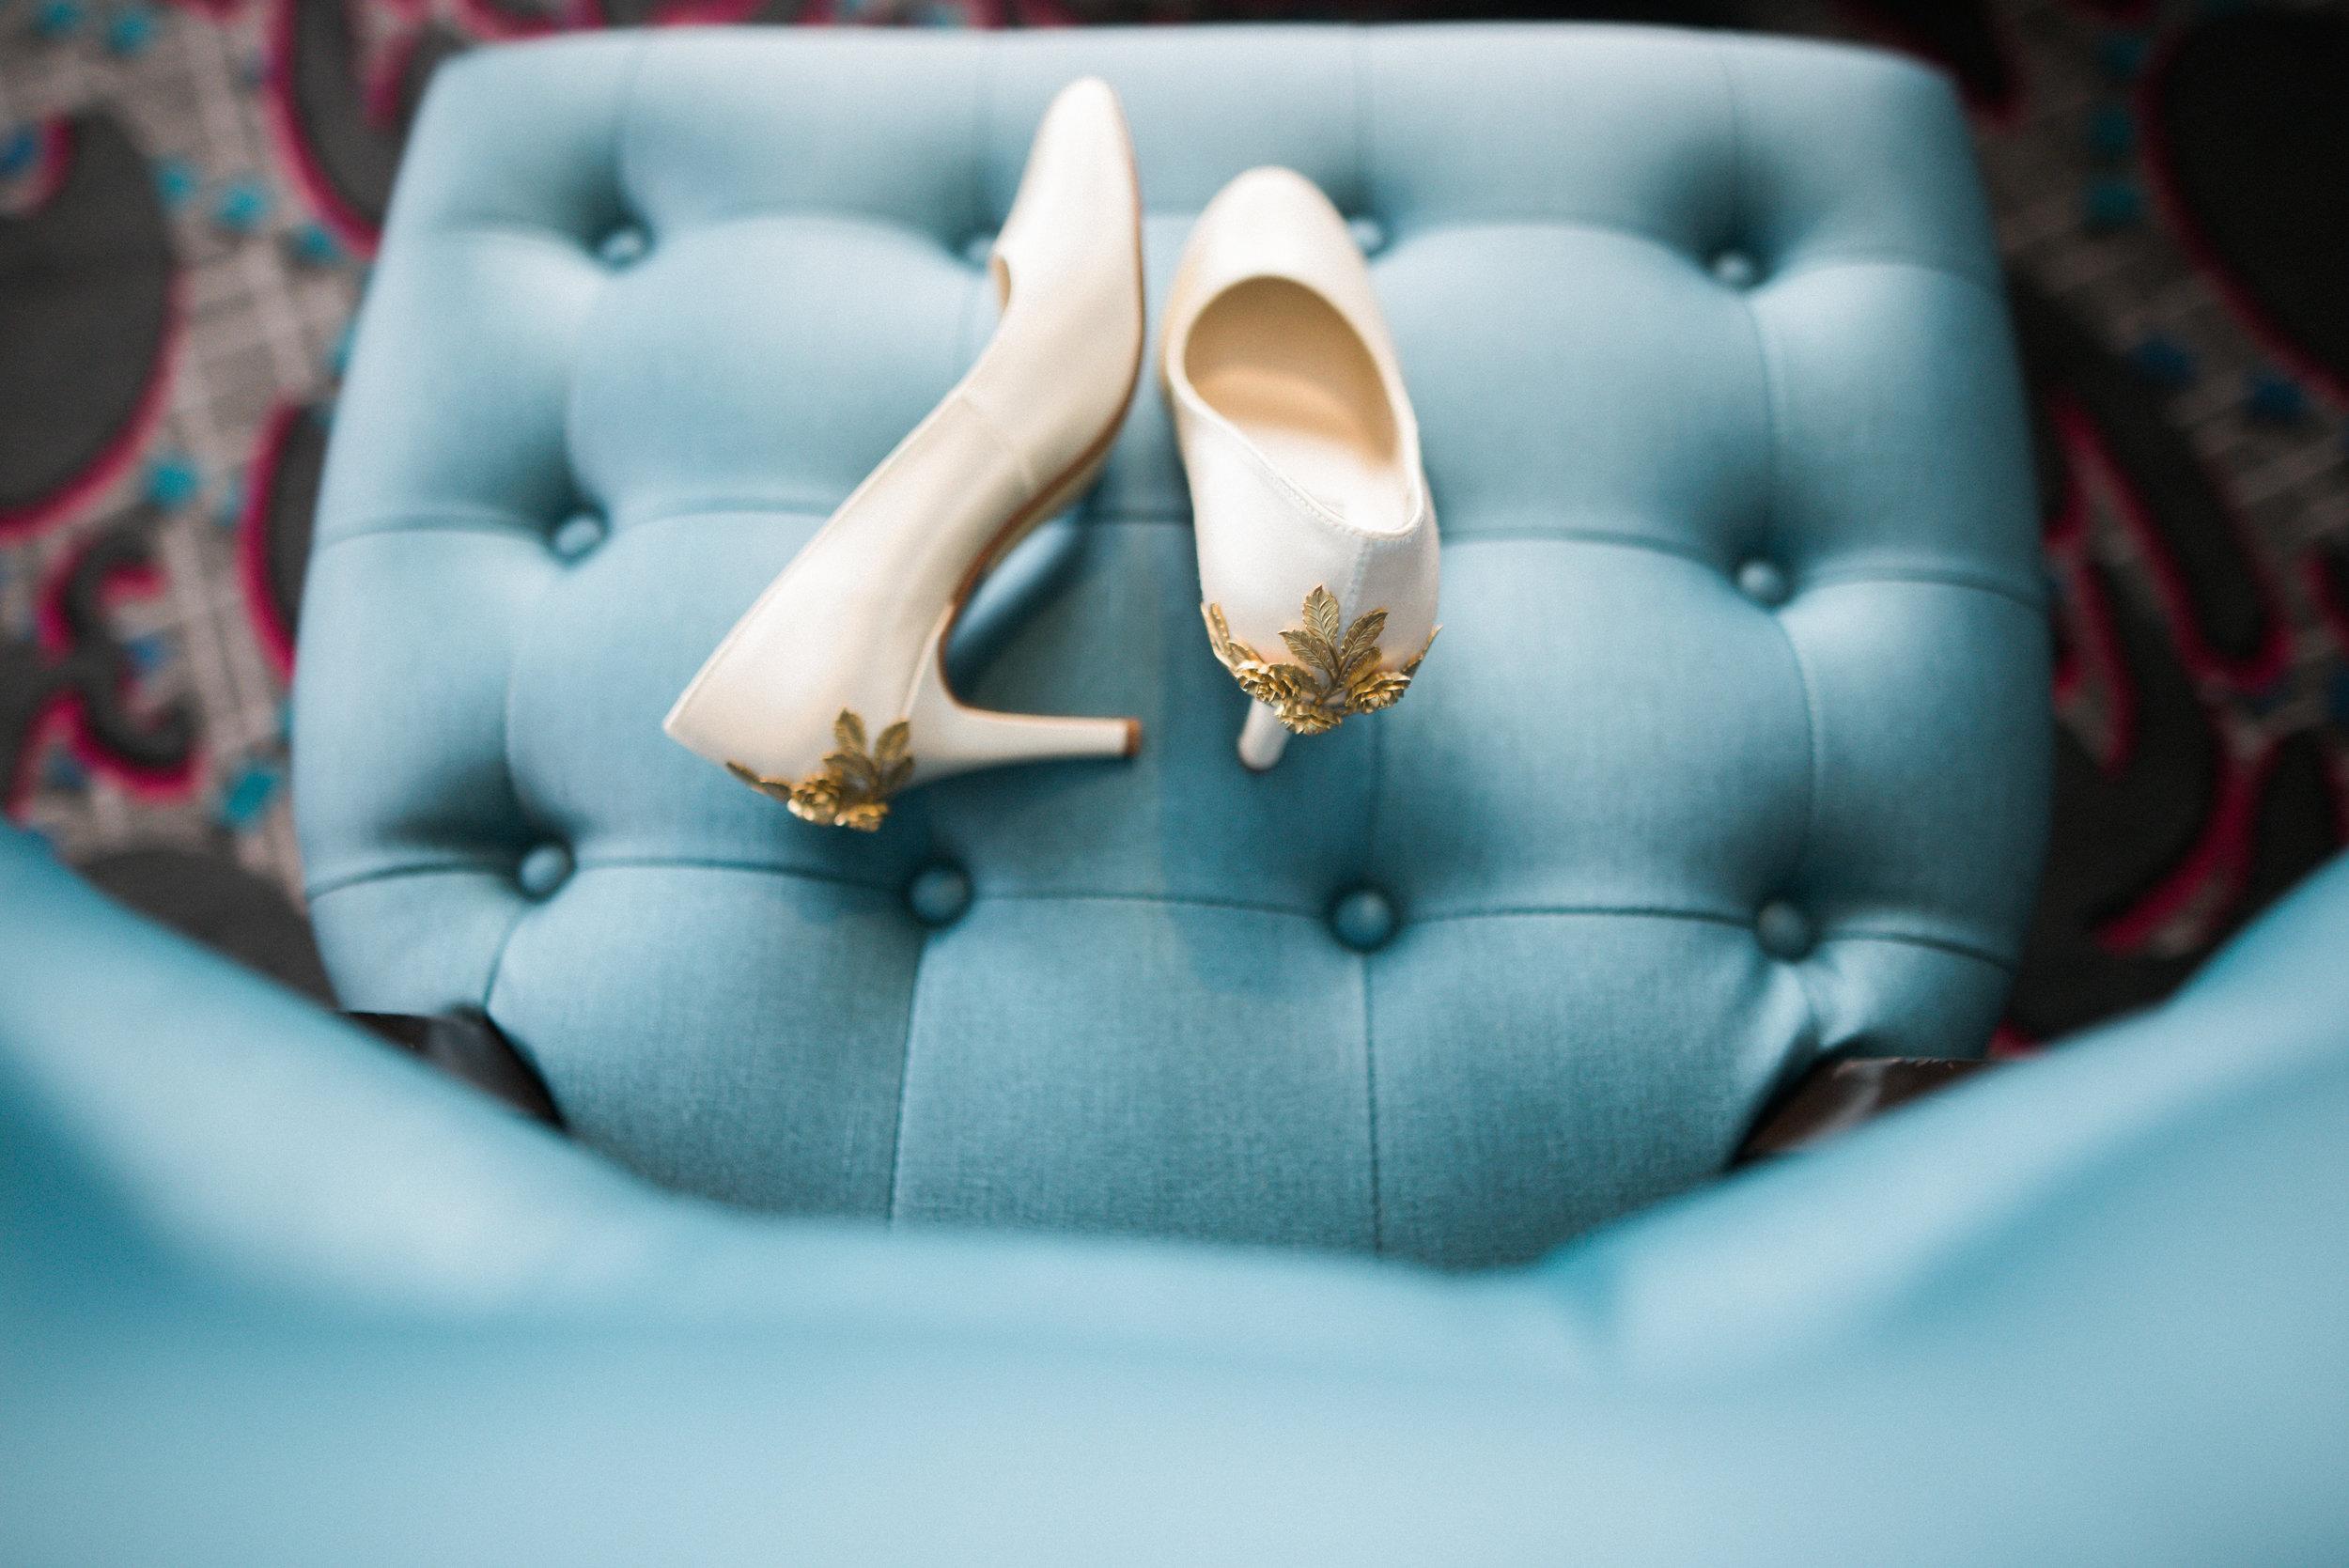 david-rosalyn-wedding-9.jpg